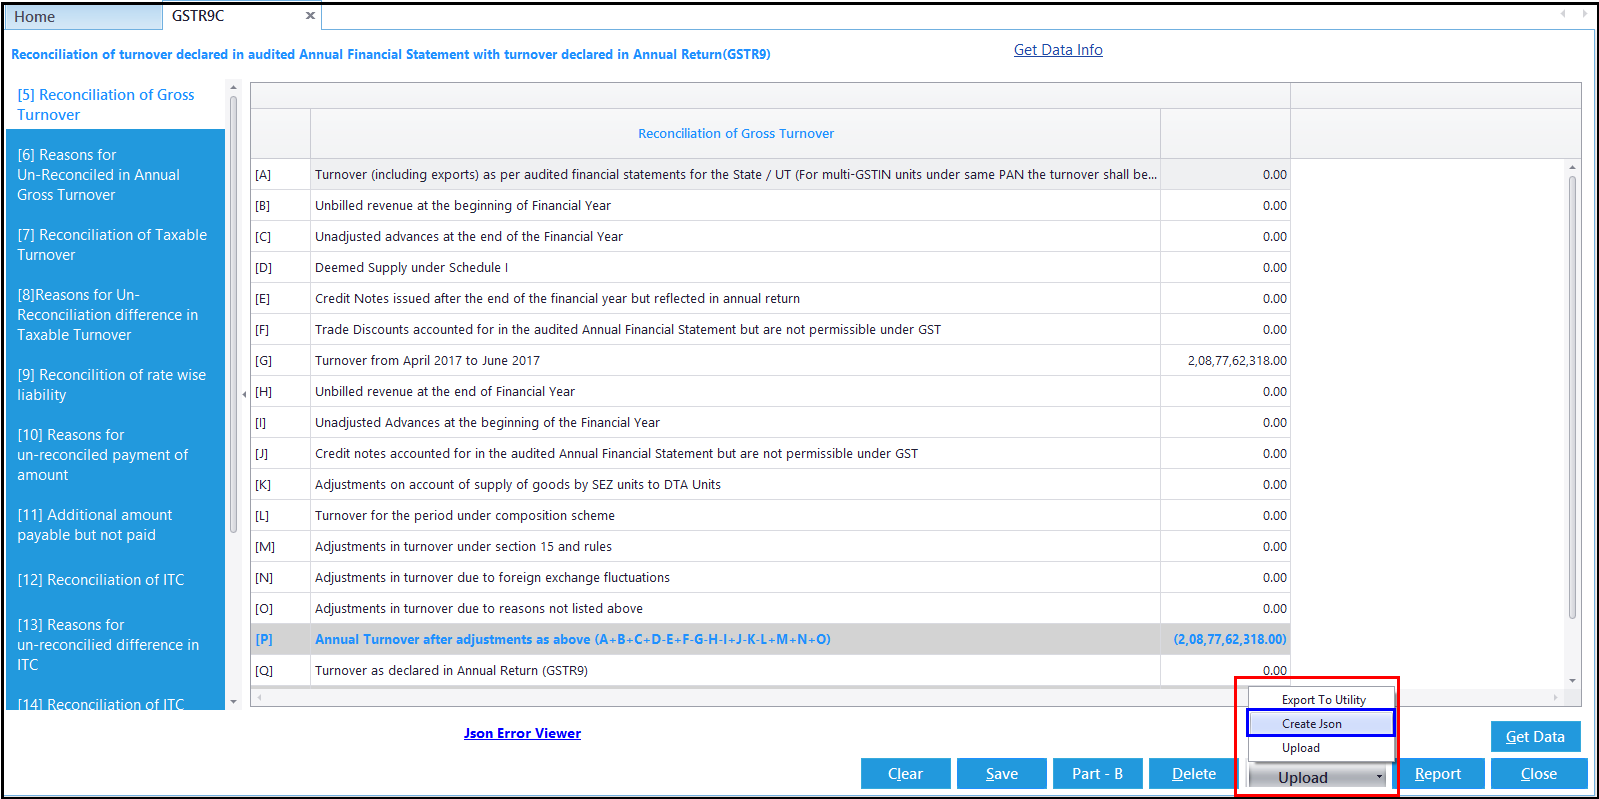 2.GSTR-9C JSON creation and upload-Create JSON